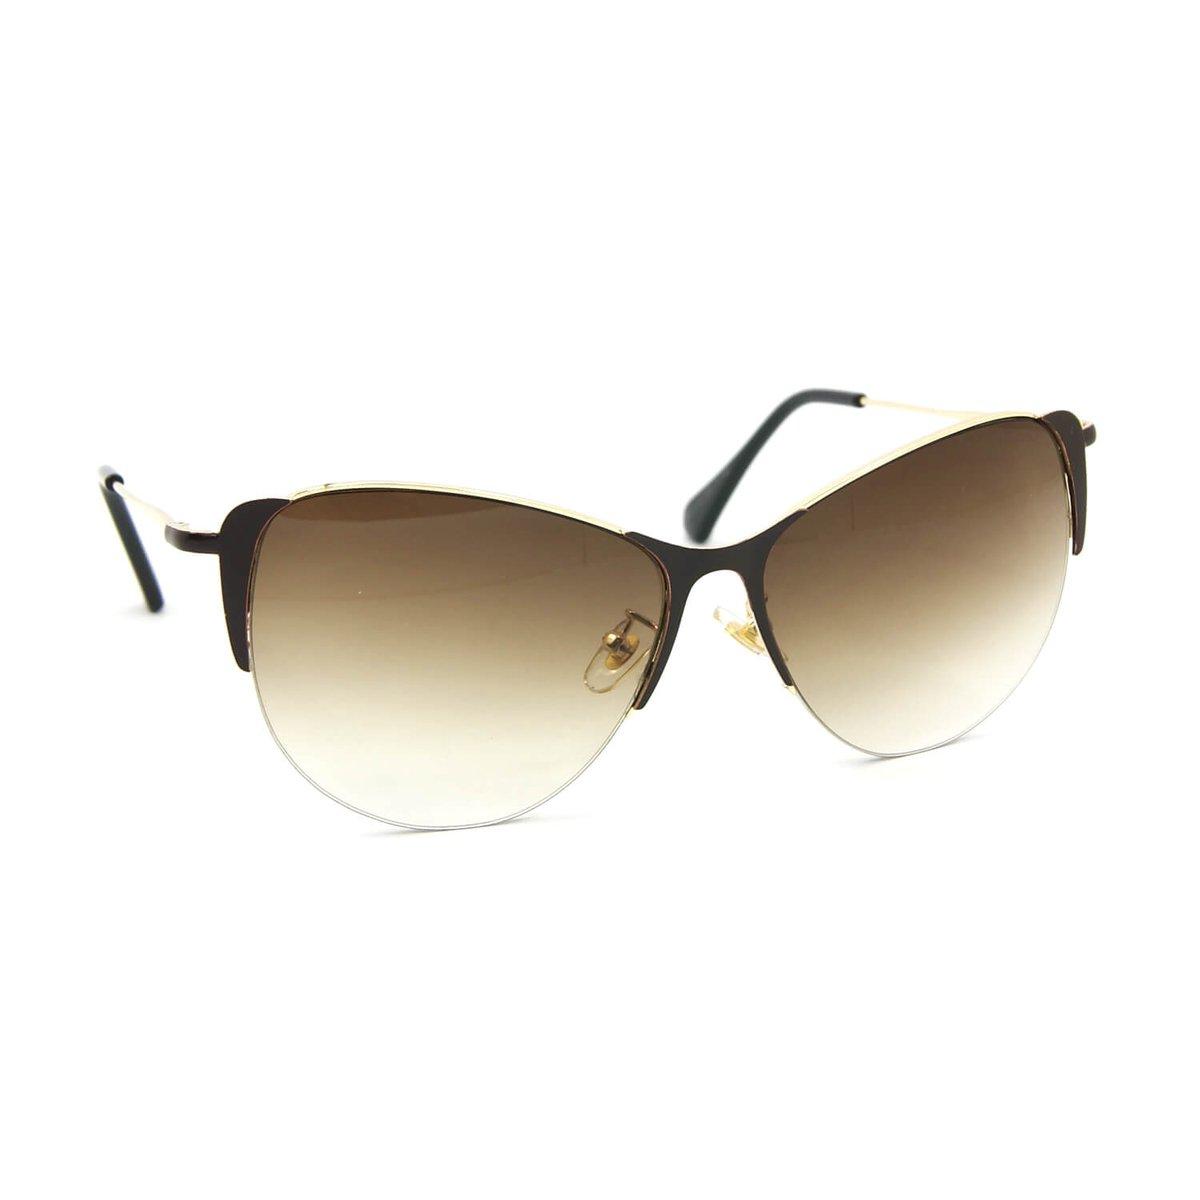 07dbd83b6 Óculos de Sol Gatinha Glamour Lente Degradê - Marrom | Zattini